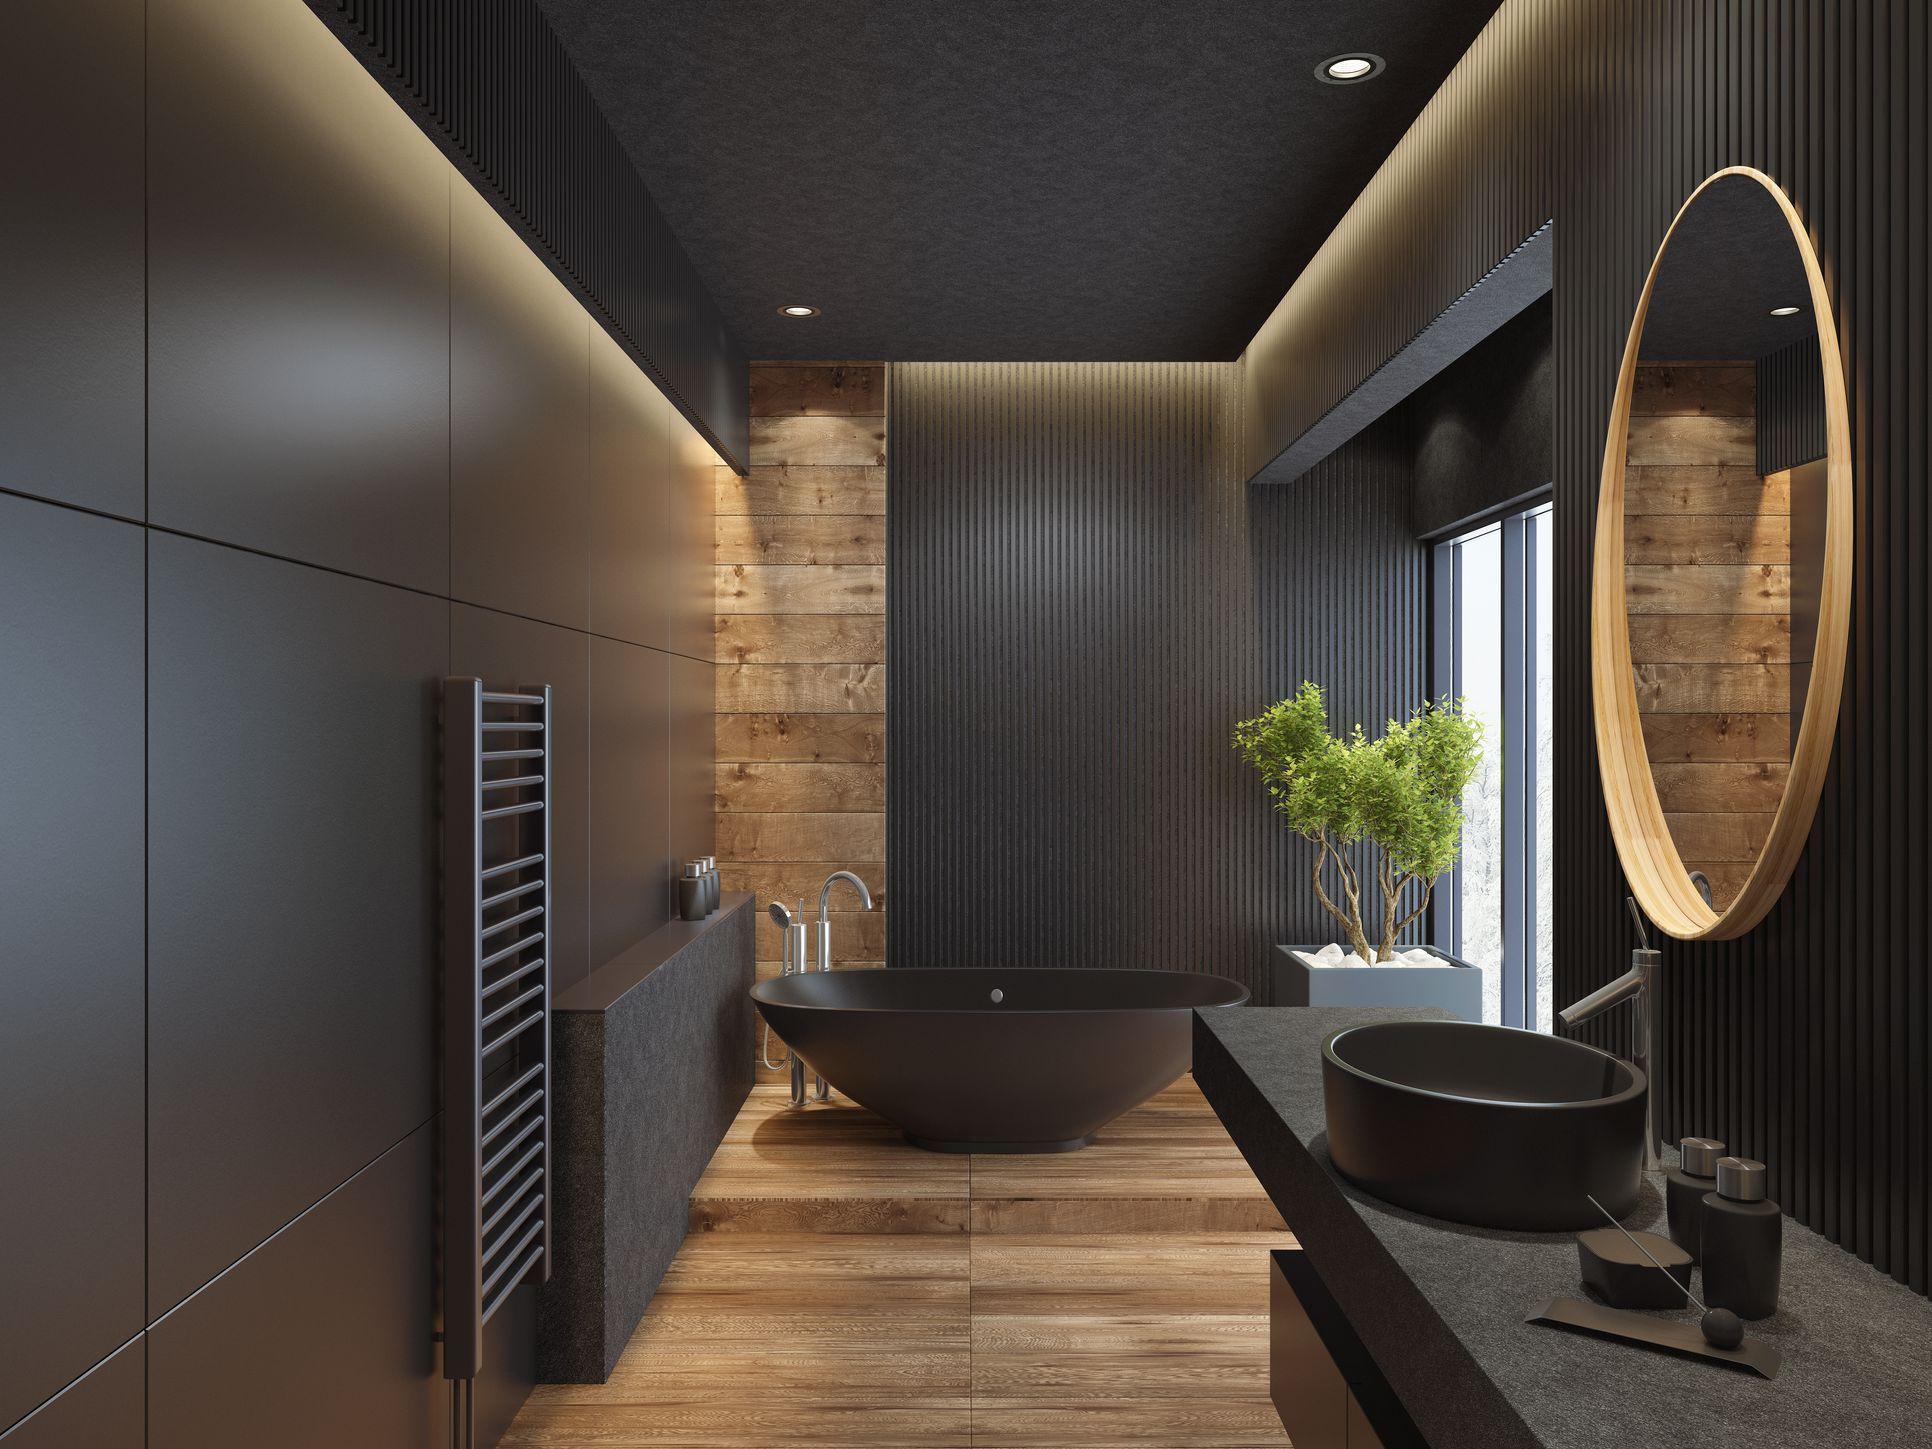 10 Scandinavian Style Bathrooms To Inspire Your Remodel